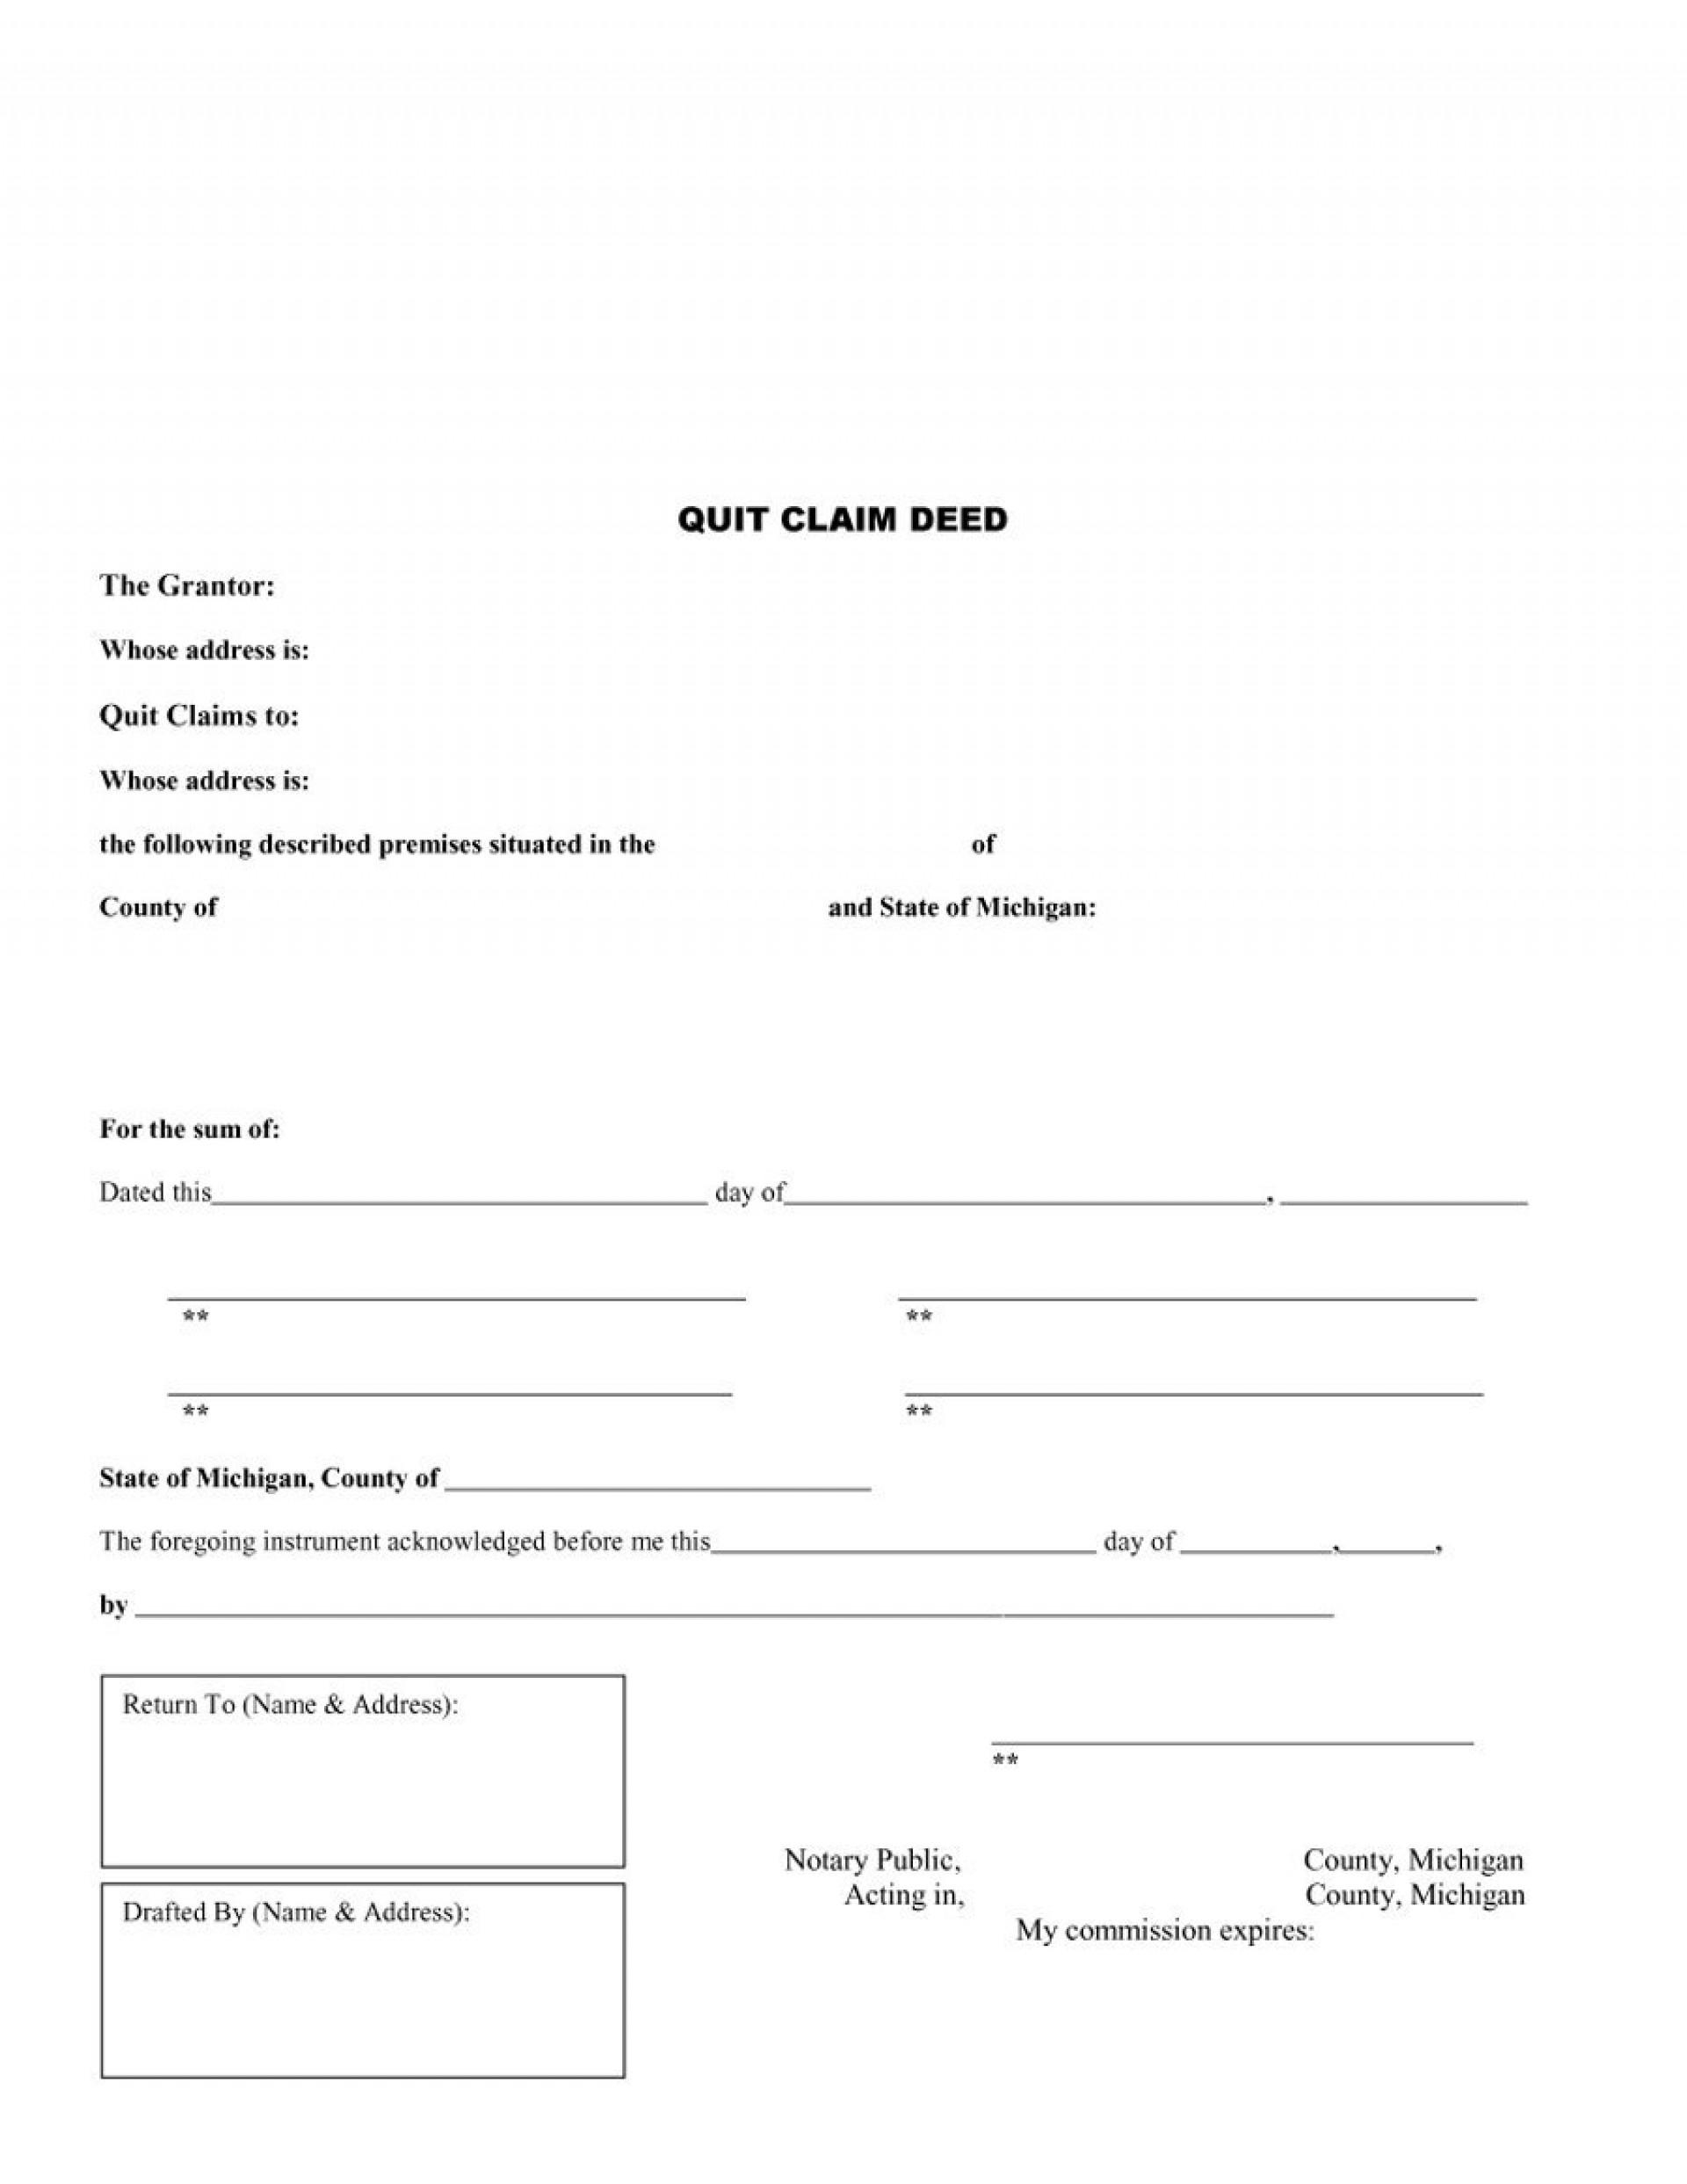 Free Printable Quit Claim Deed Form Michigan | Mbm Legal - Free Printable Quit Claim Deed Form